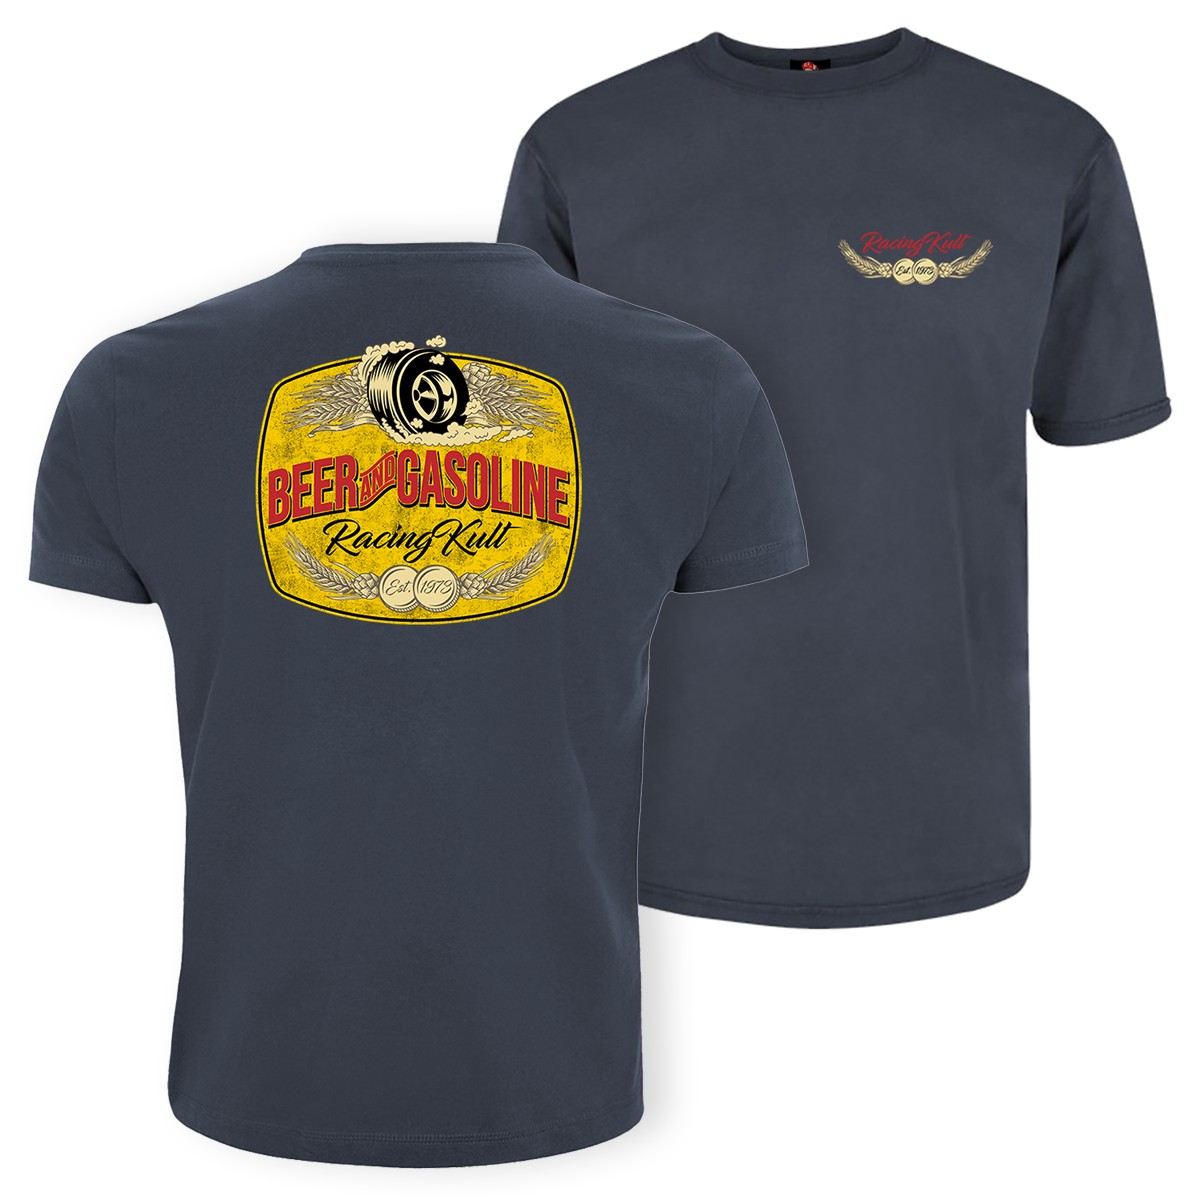 Racing Kult T-Shirt Oversized Beer and Gasoline